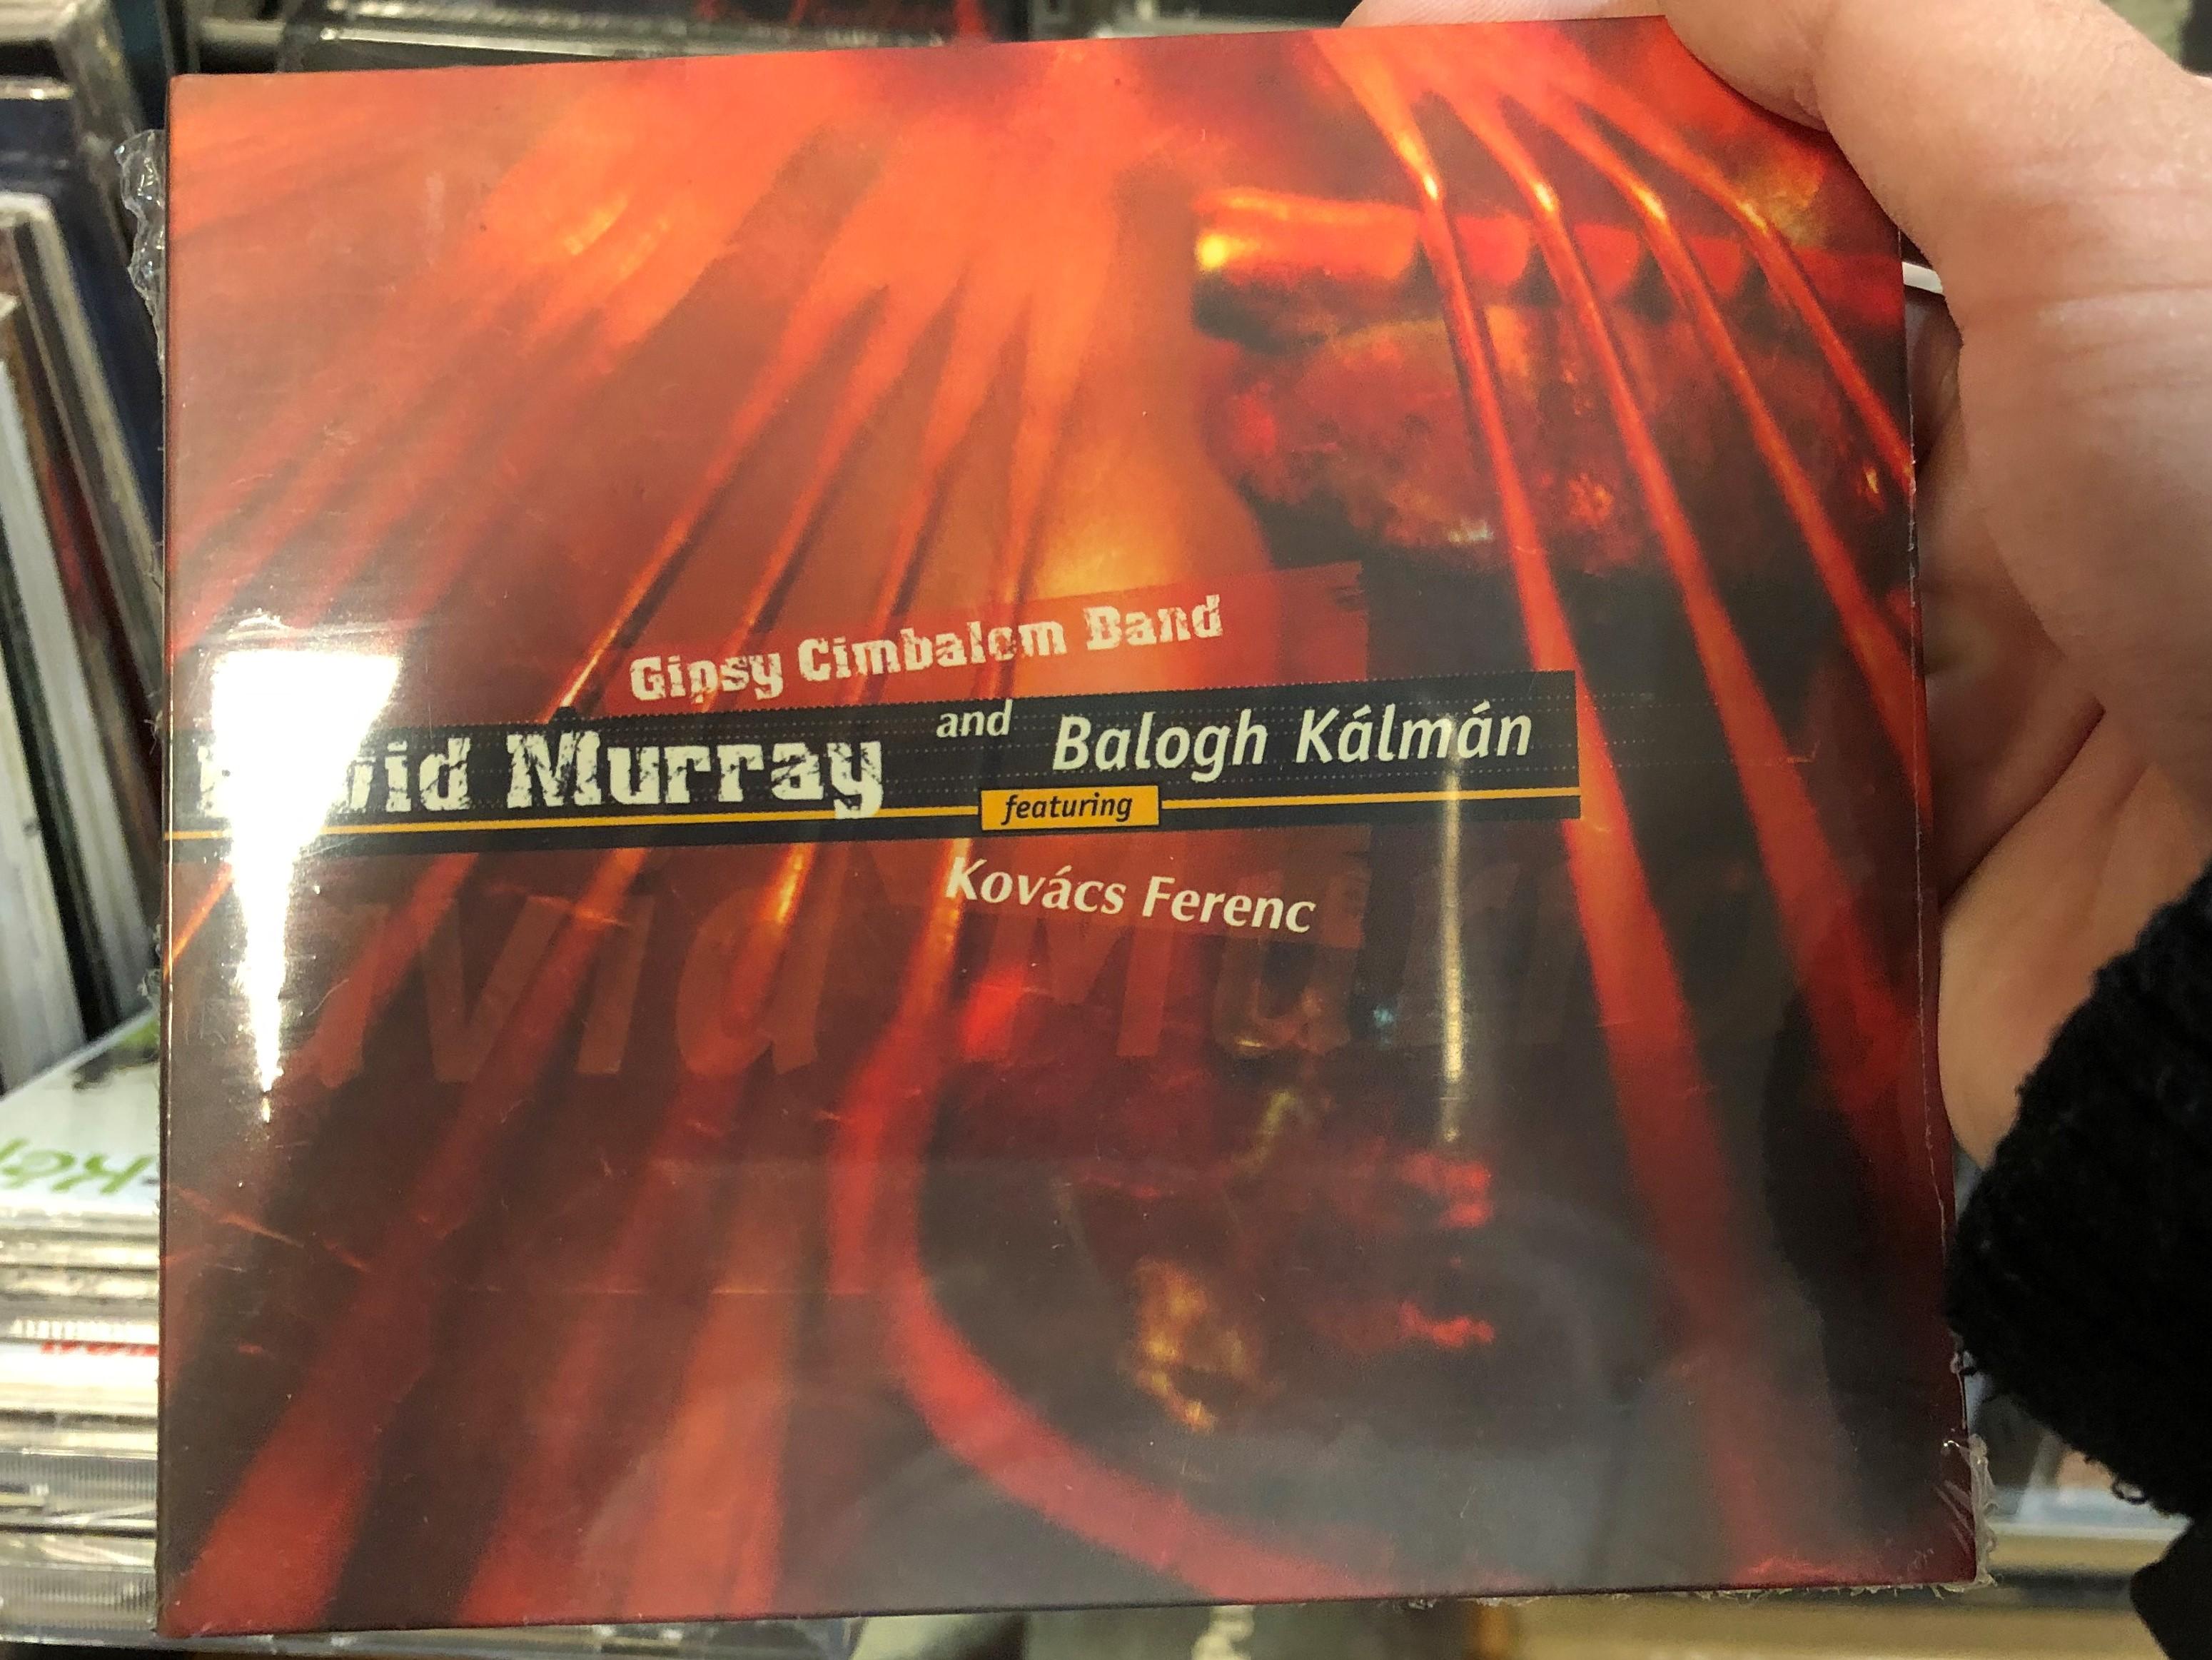 gipsy-cimbalom-band-david-murray-and-balogh-k-lm-n-featuring-kov-cs-ferenc-fon-budai-zeneh-z-audio-cd-2004-fa-216-2-1-.jpg